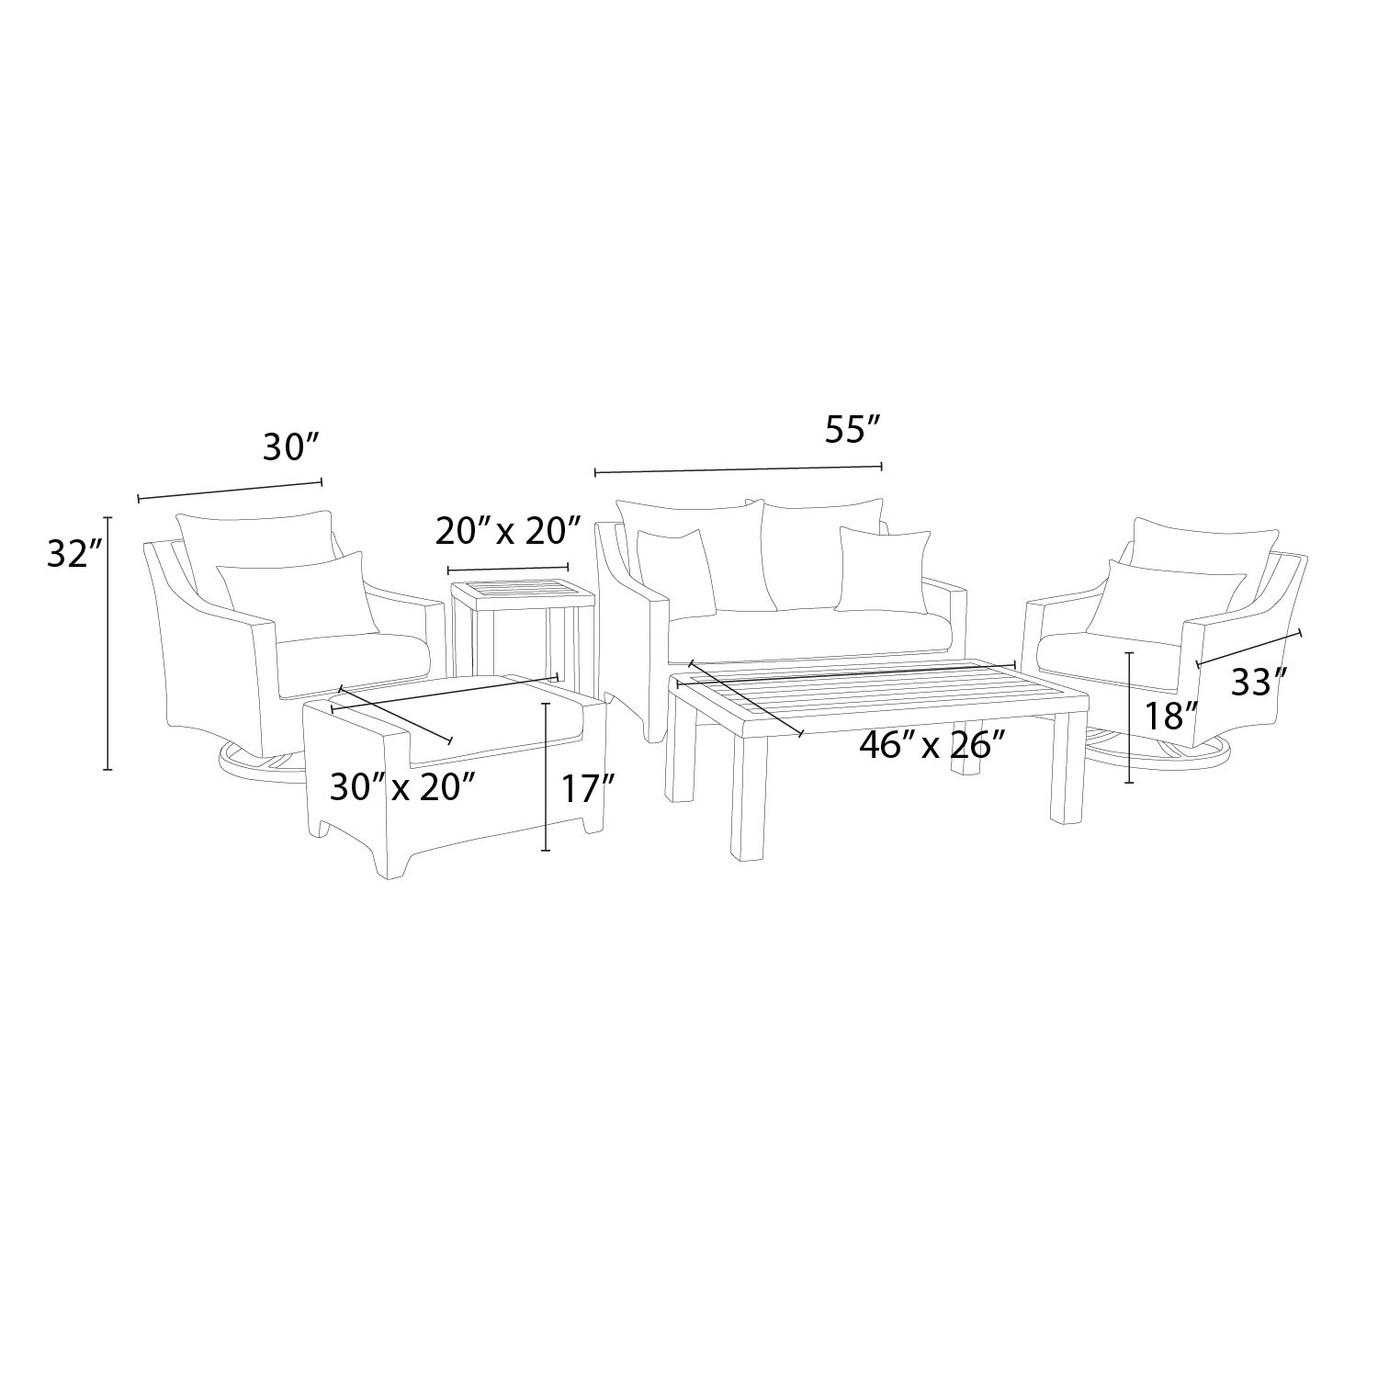 Deco™ Deluxe 6pc Love & Motion Club Seating Set - Maxim Beige